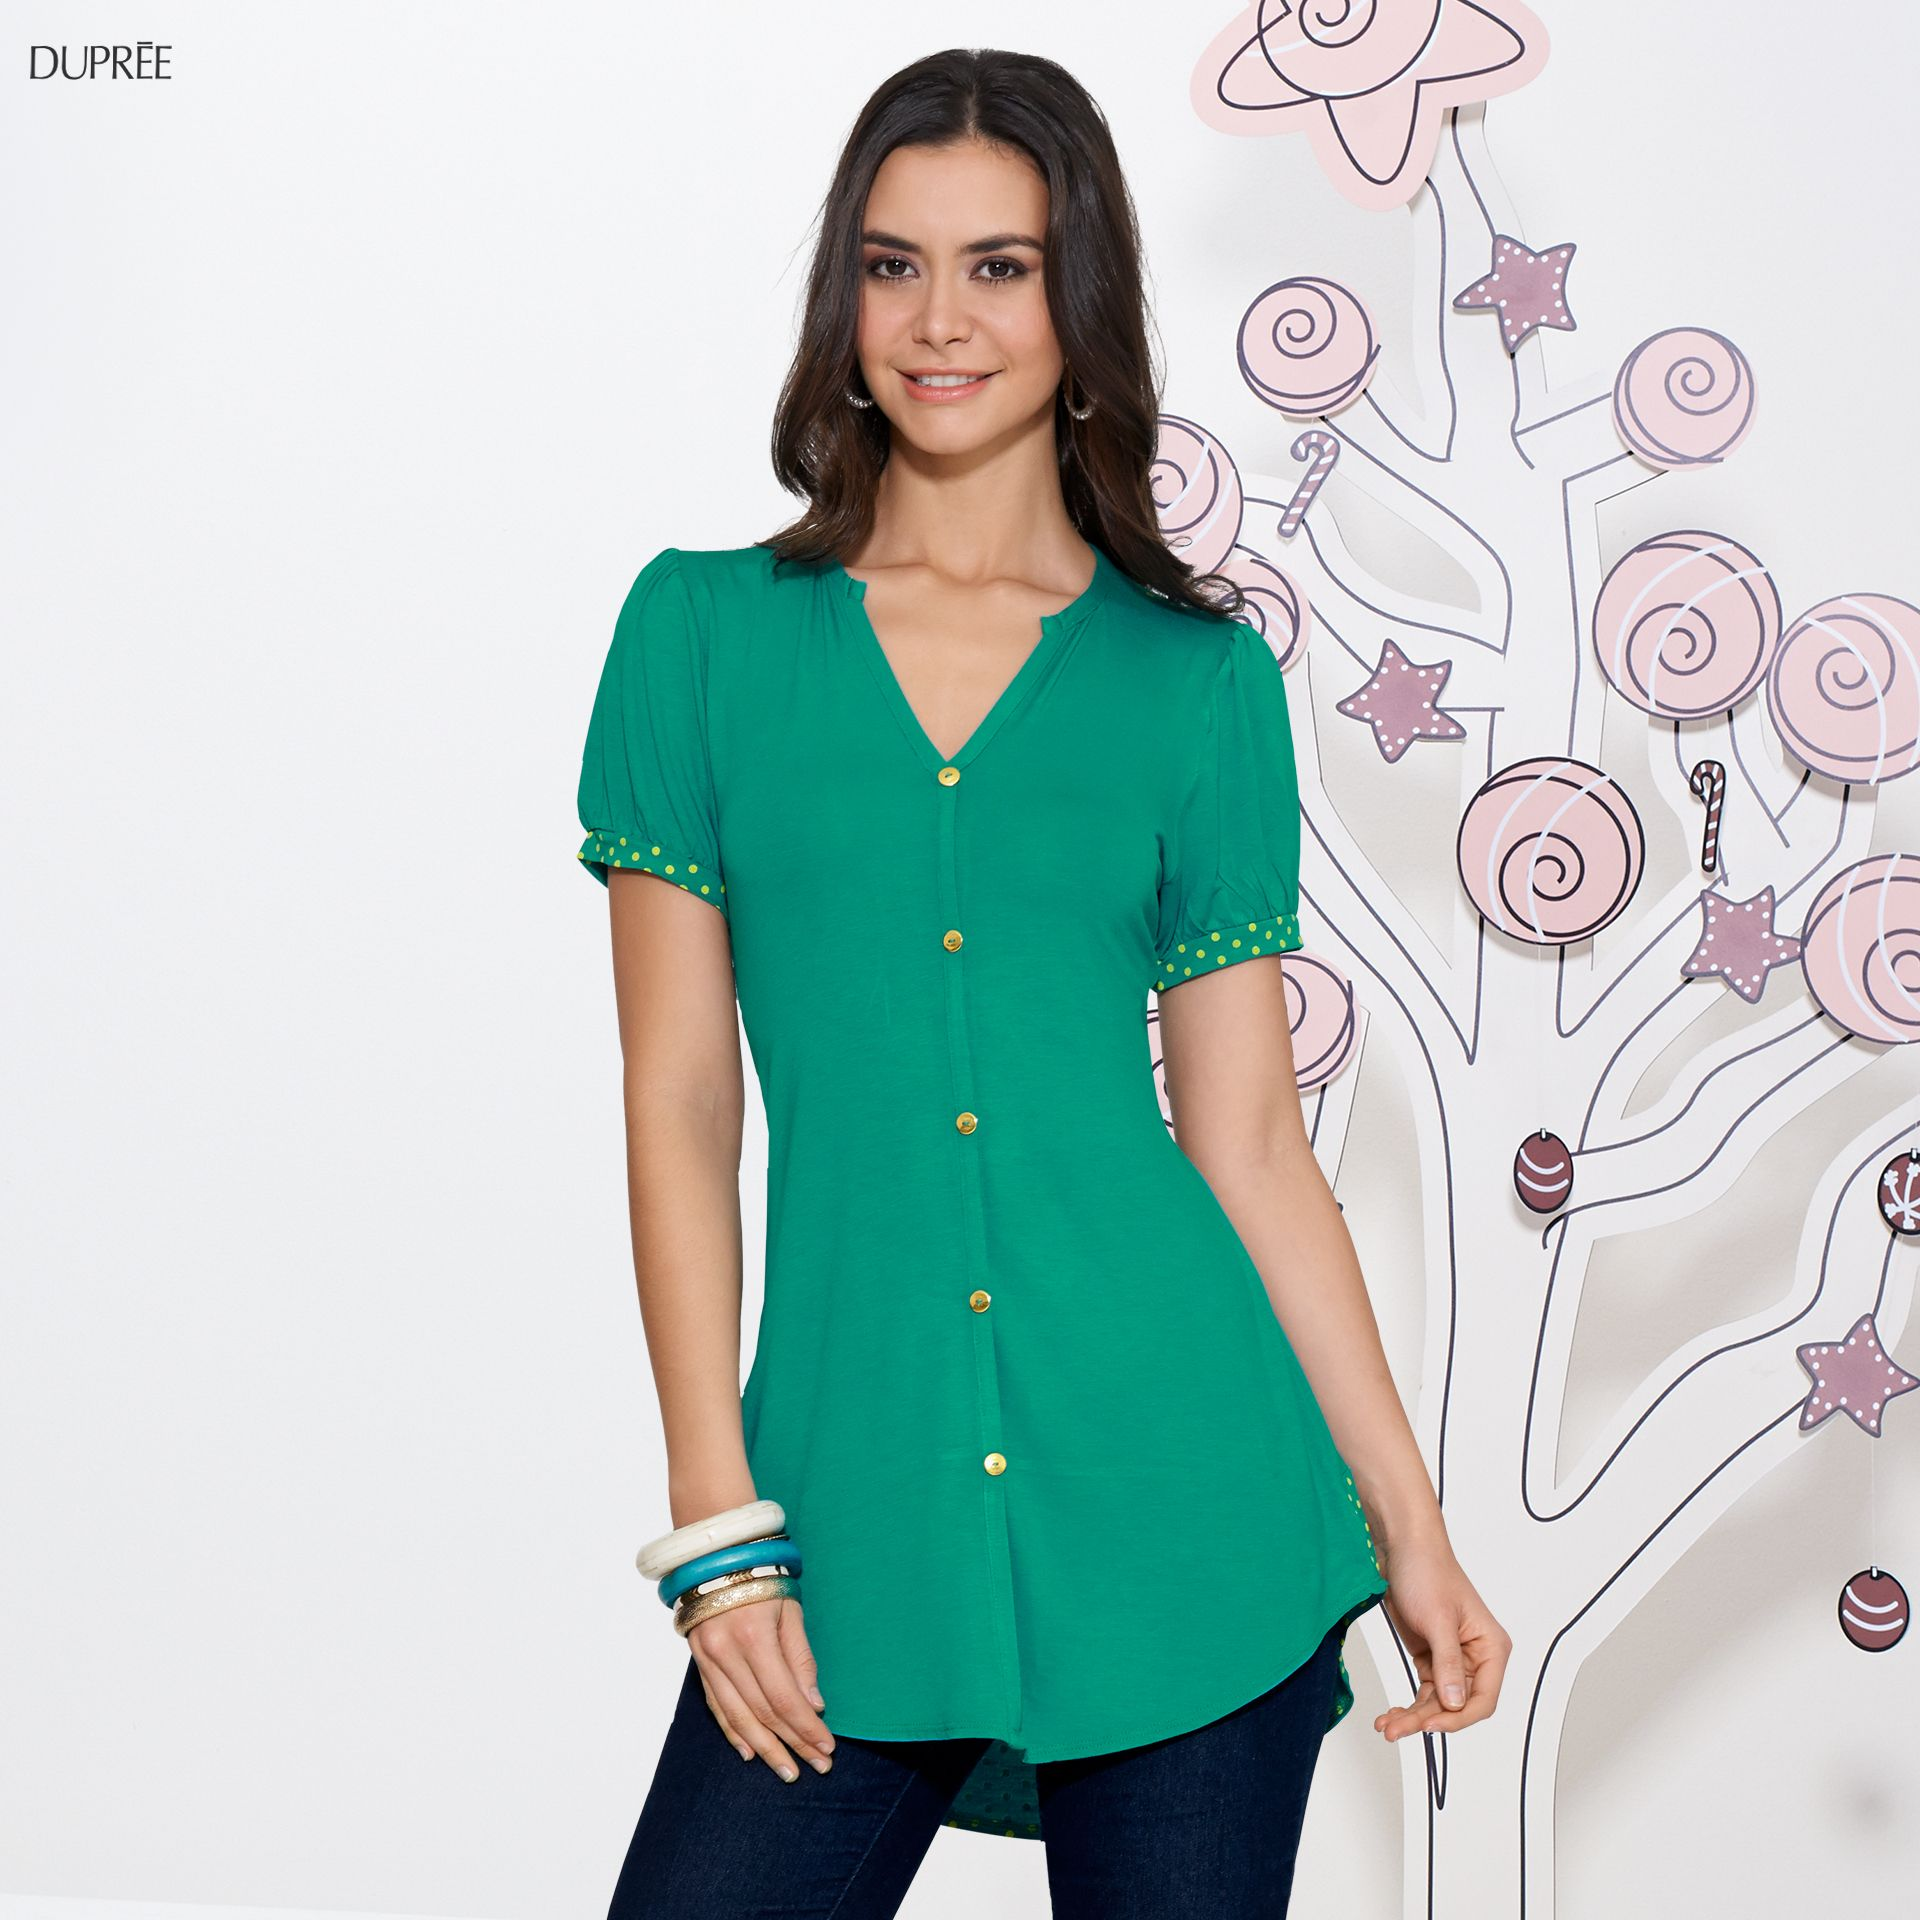 Blusa verde combinada con jean. Outfit